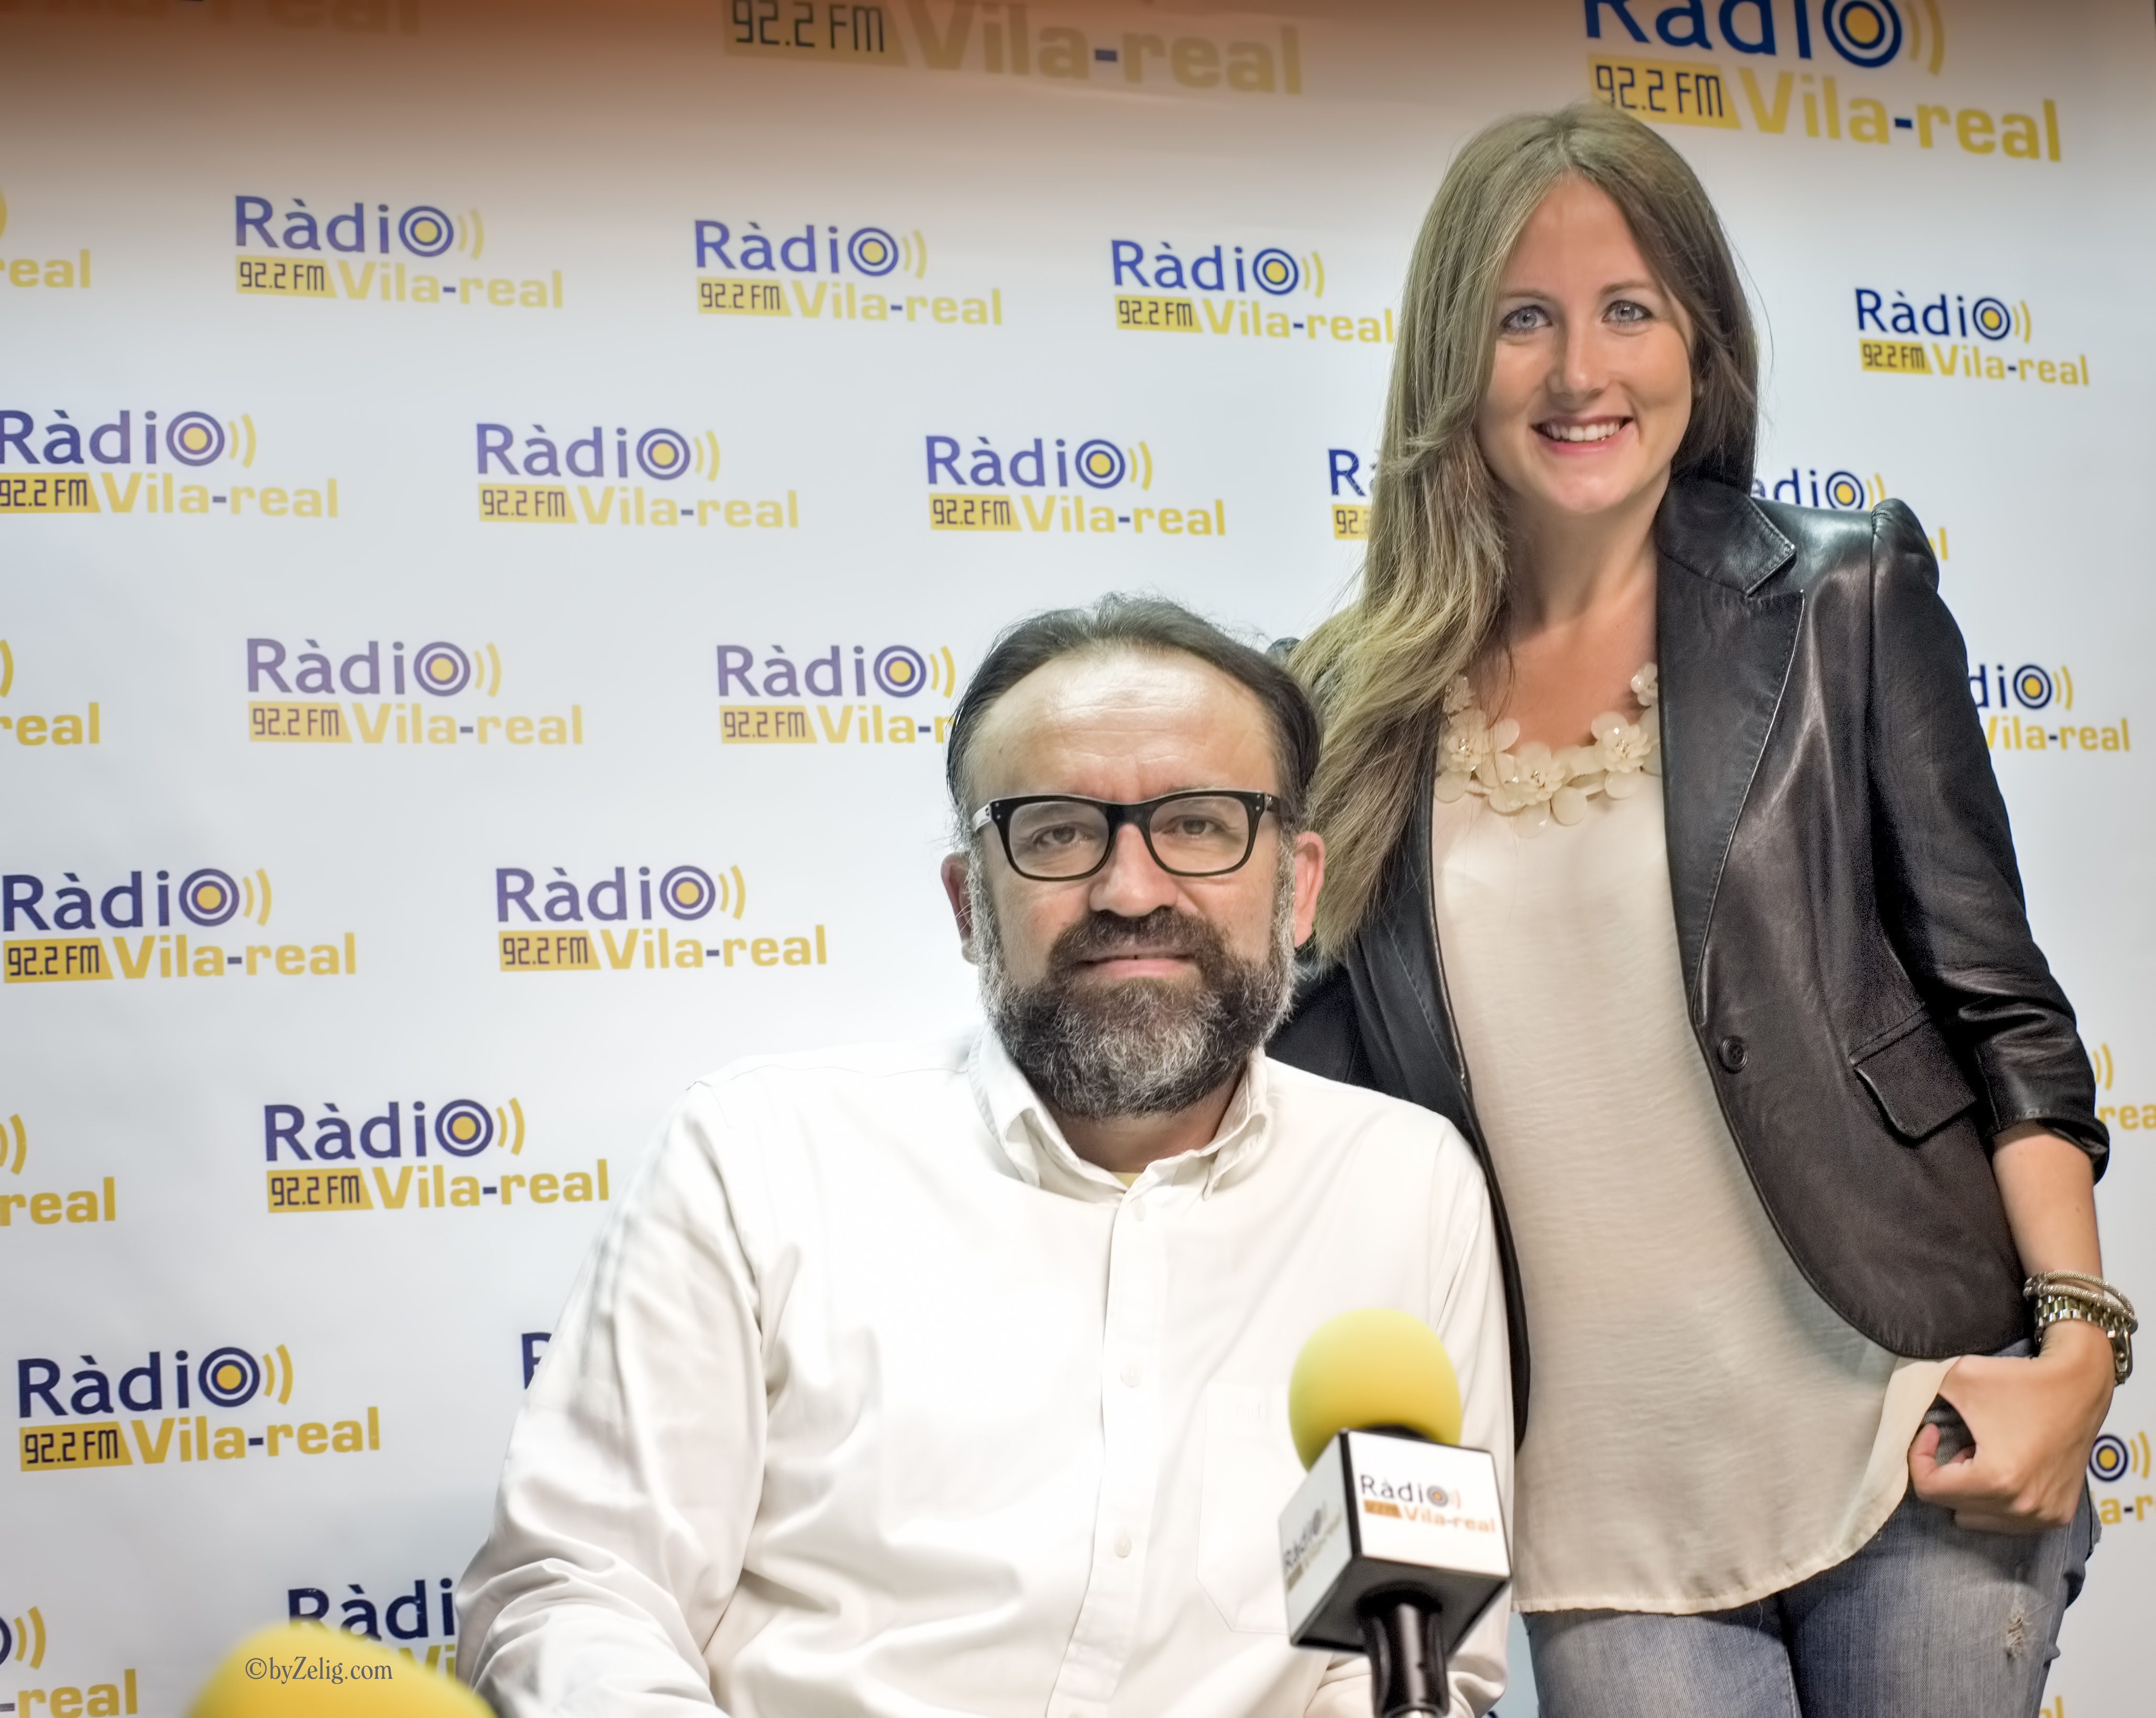 Esports Radio Vila-real. Programa del 3 de febrero de 2017